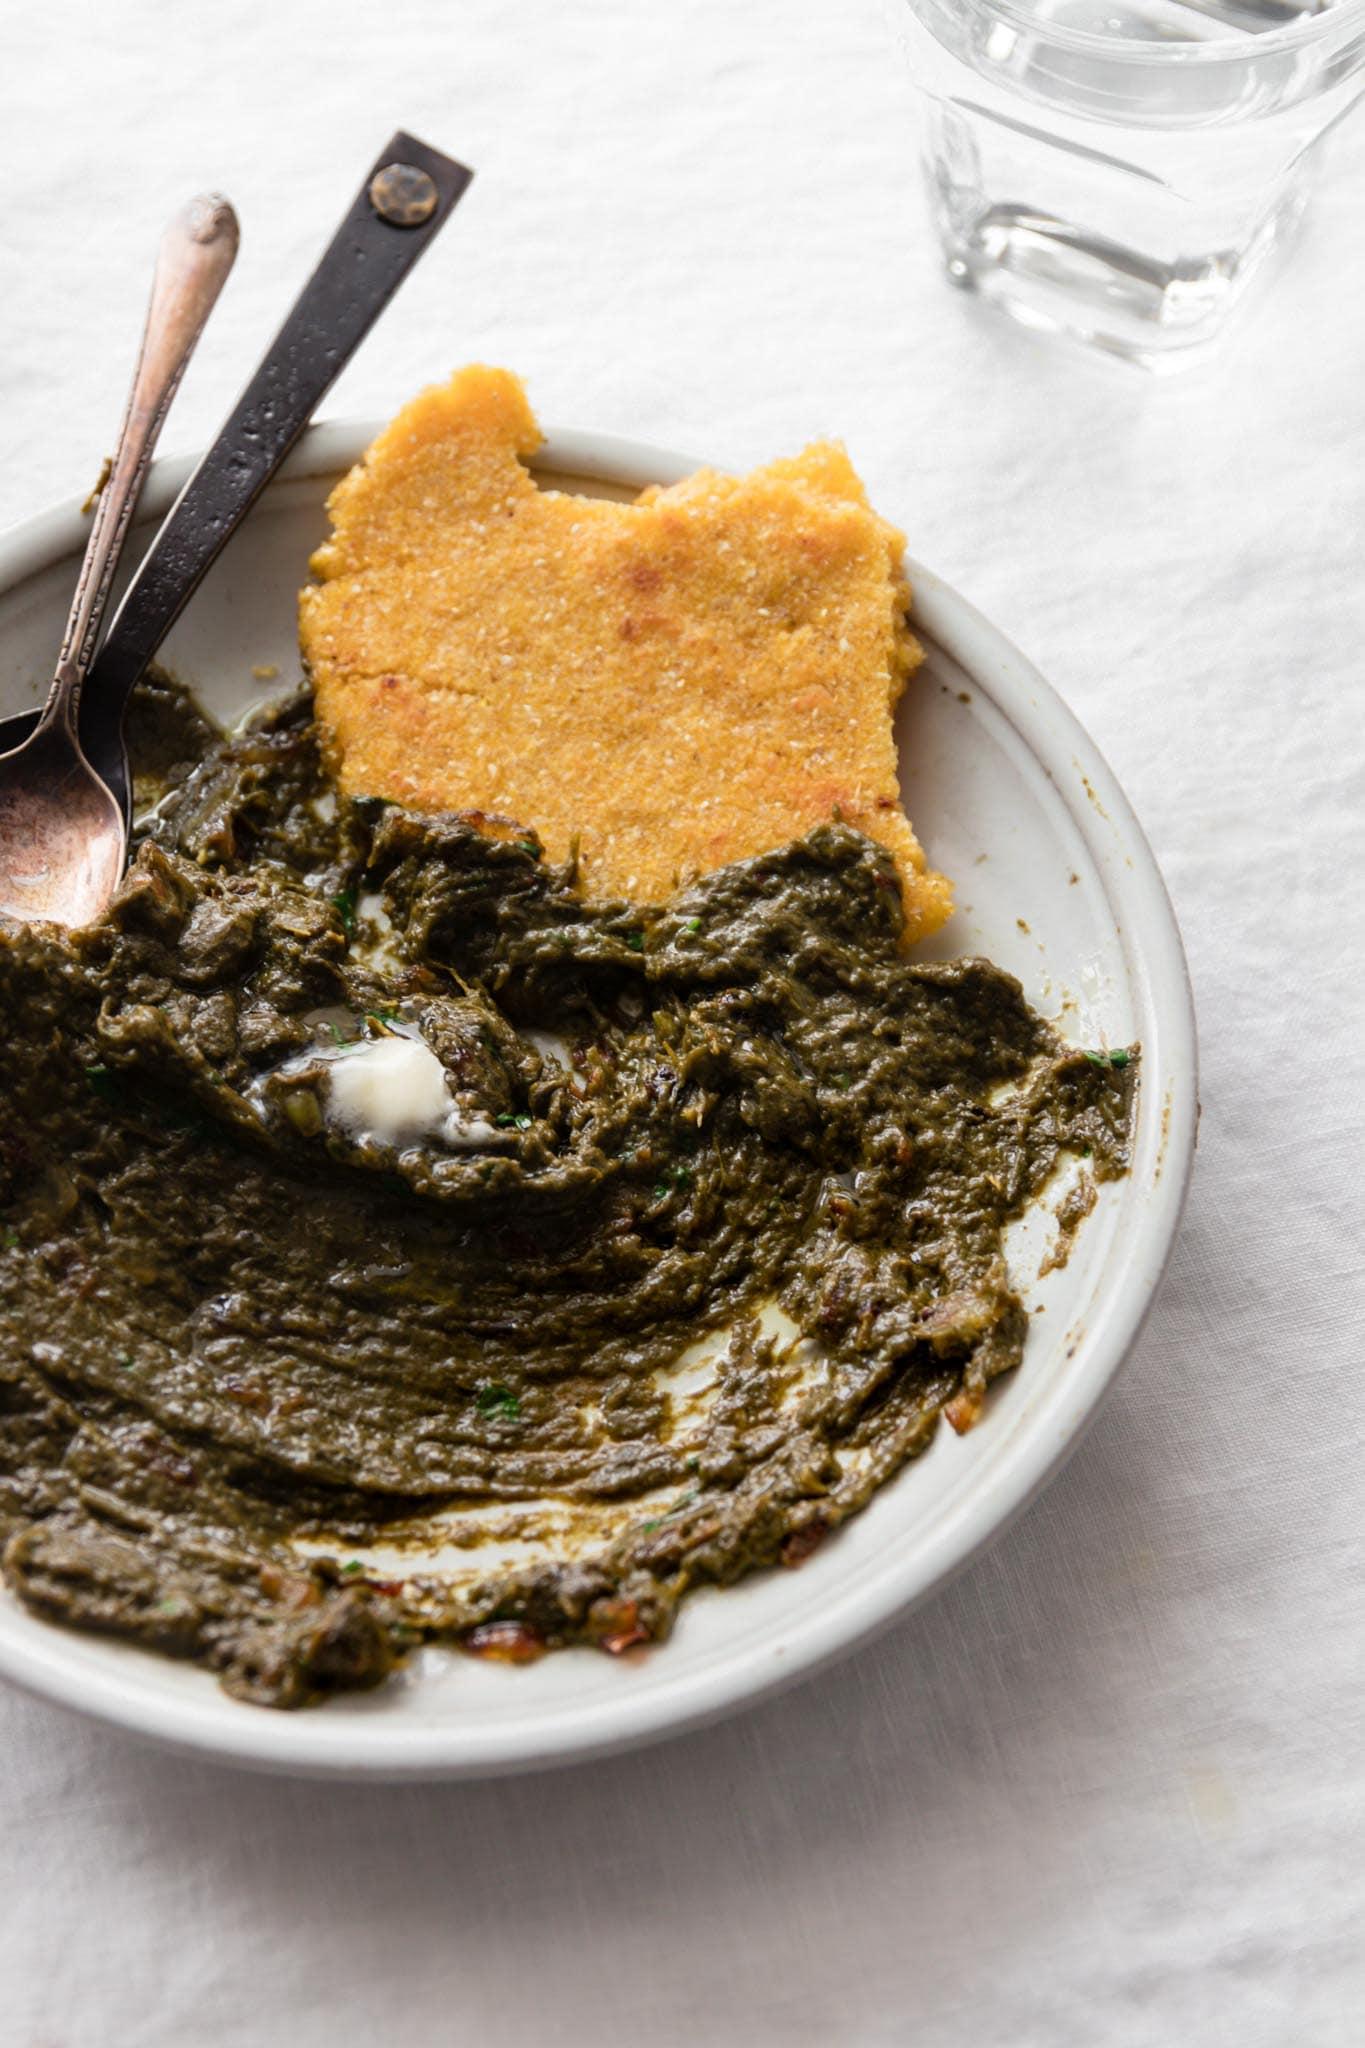 Half eaten plate of Sarson Ka Saag served with Makai ki roti (cornmeal flatbread)